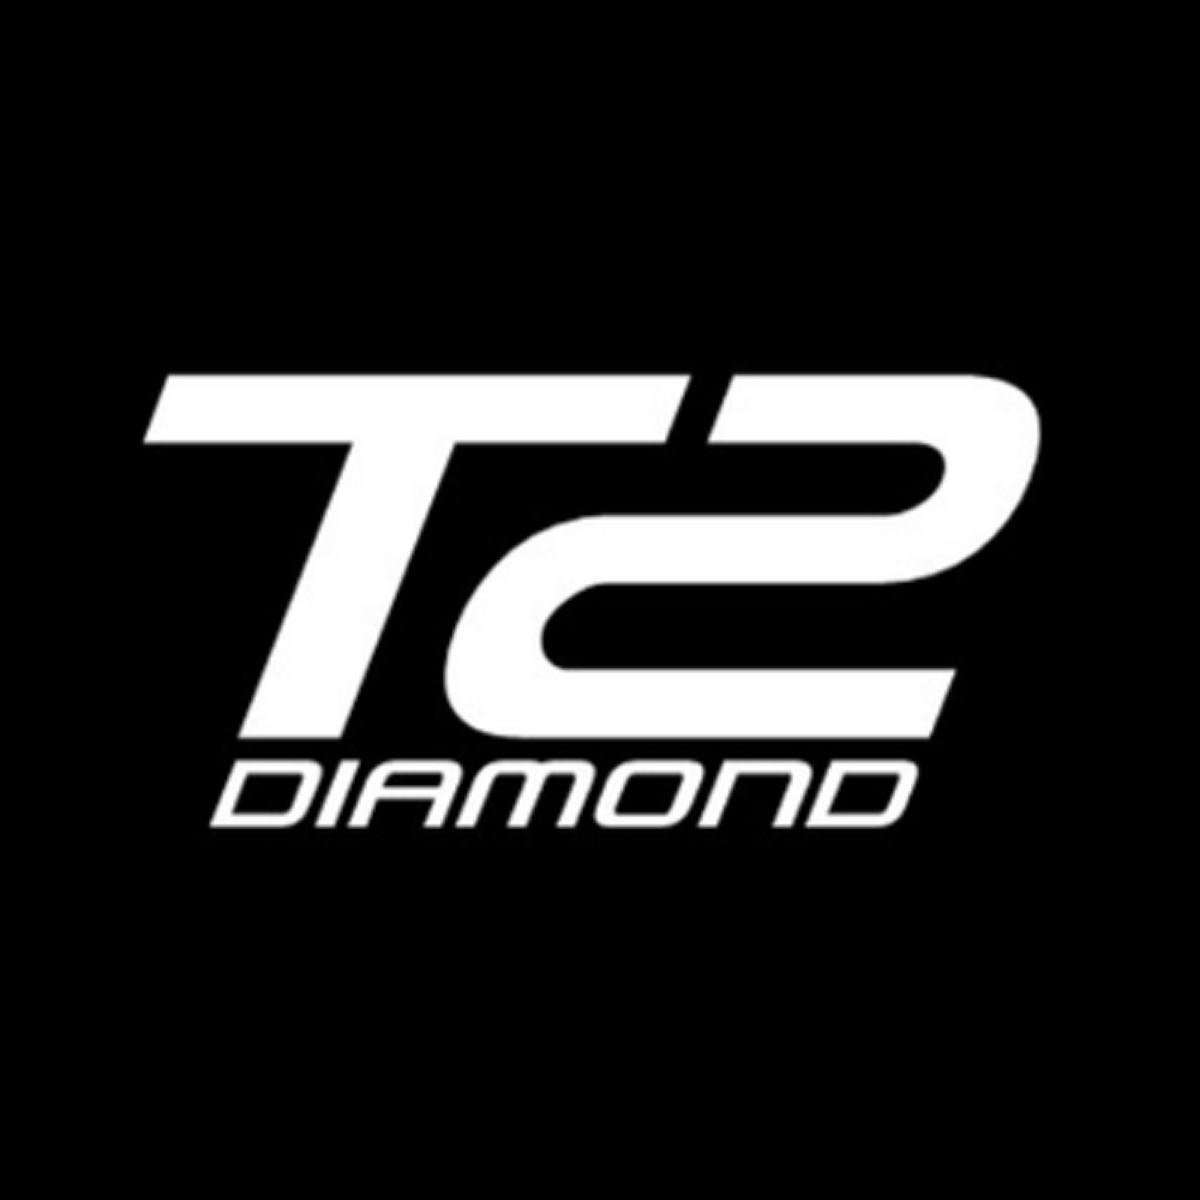 T2ダイヤモンド